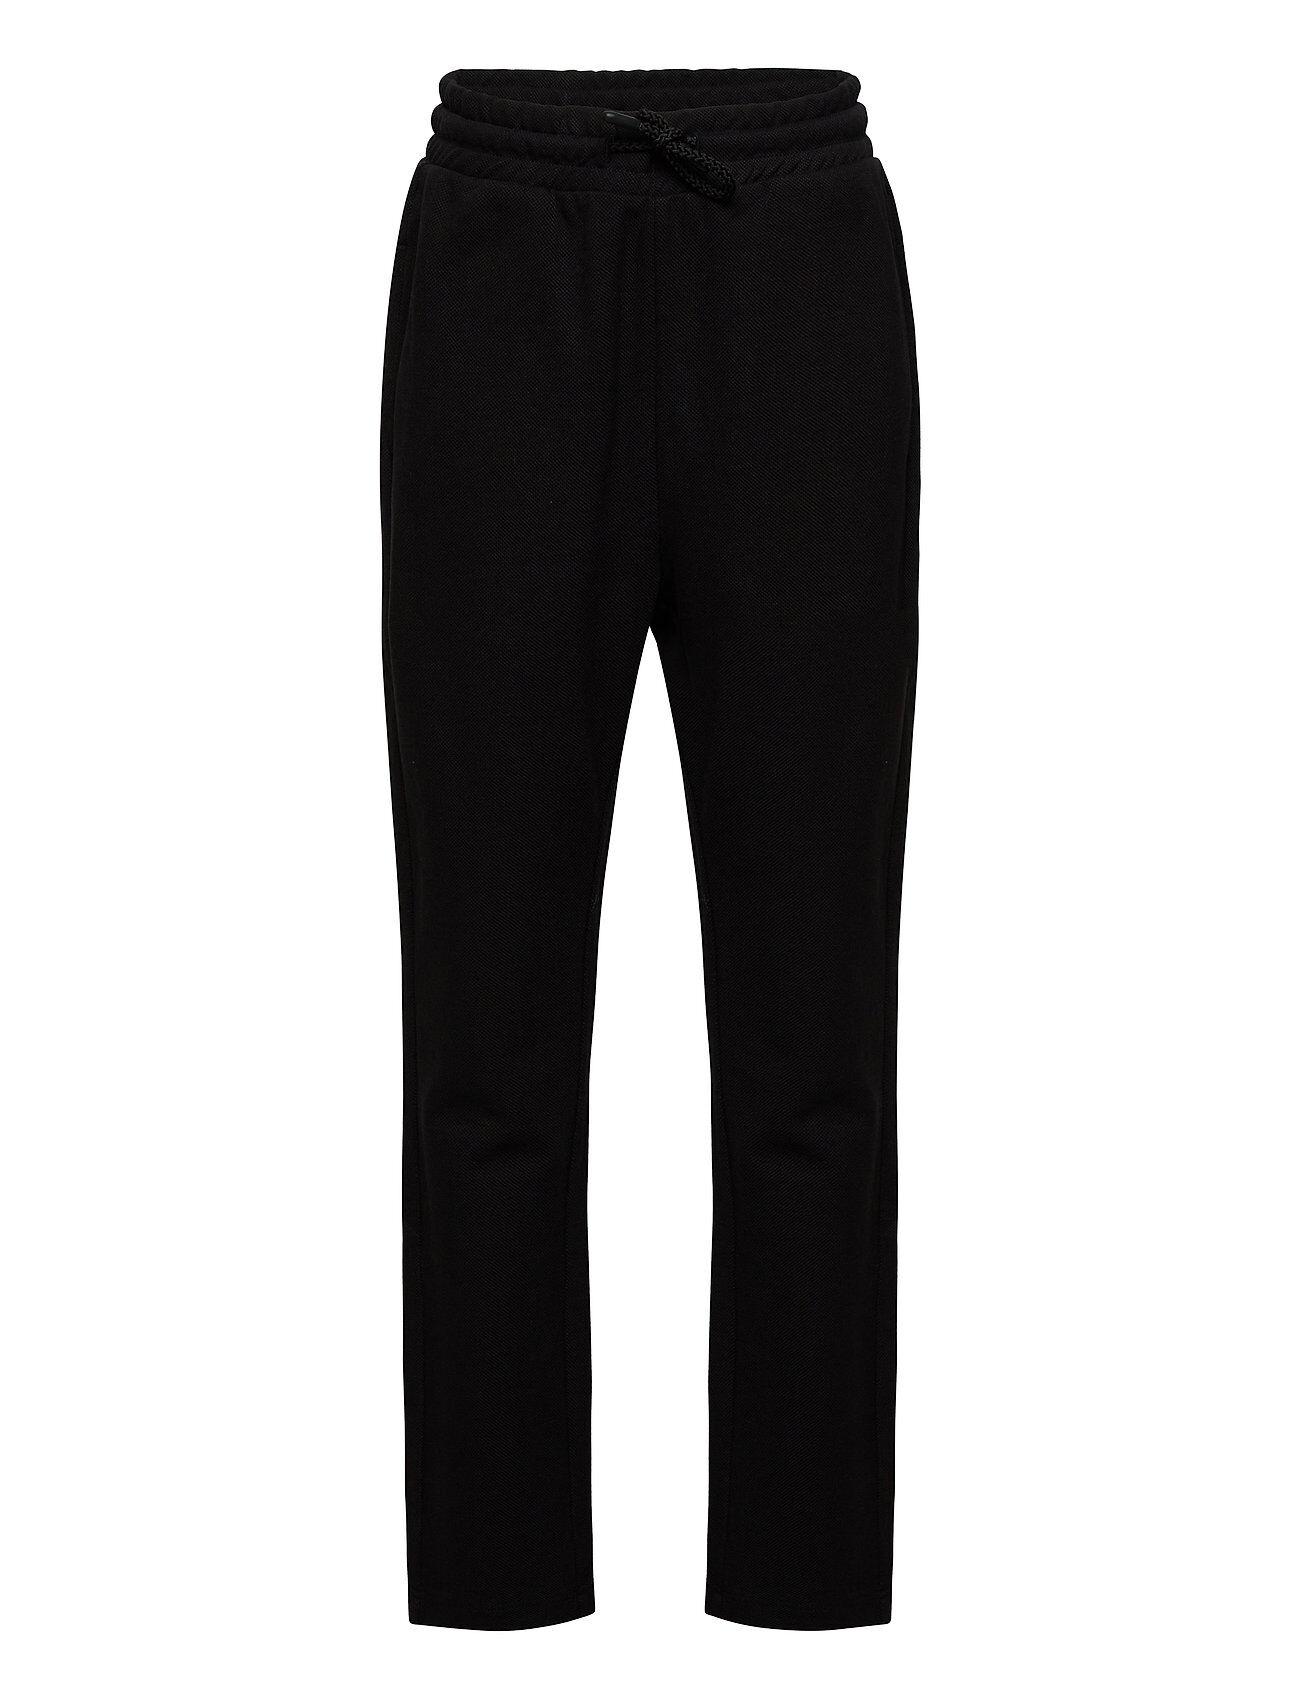 LMTD Nlmfakke Sweat Reg/Slim Pant Collegehousut Olohousut Musta LMTD